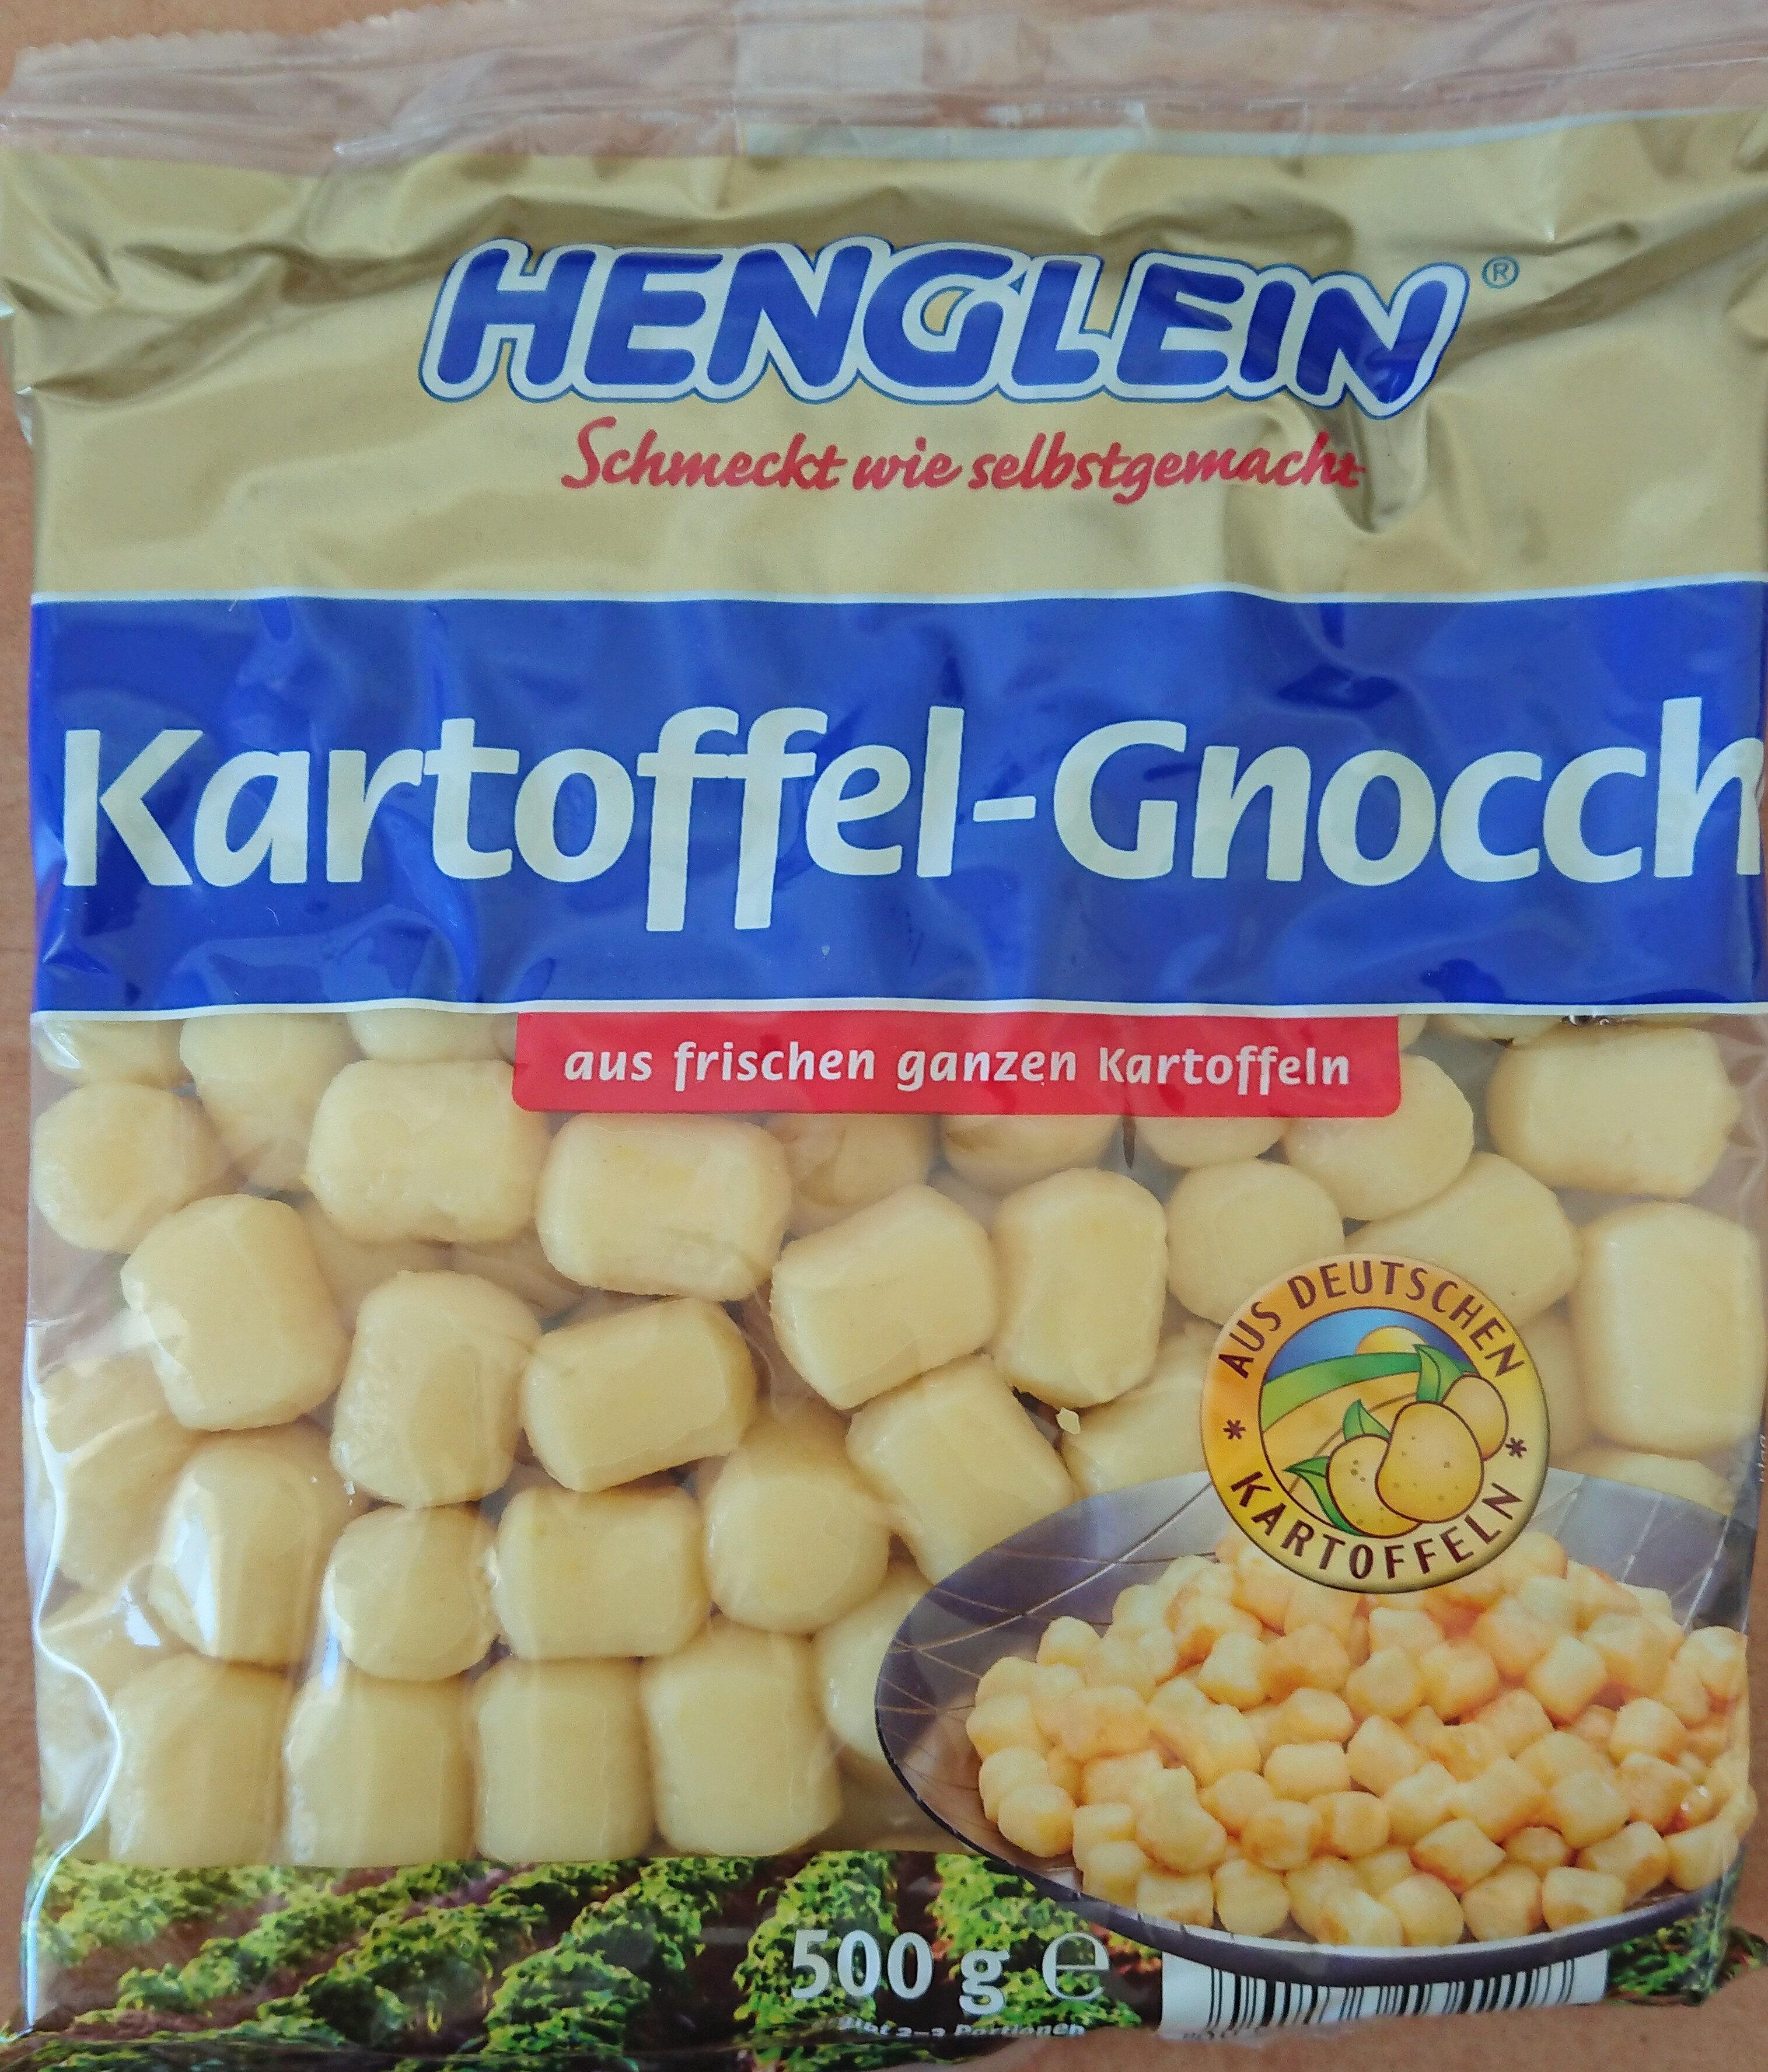 Kartoffel-Gnocchi - Produit - de